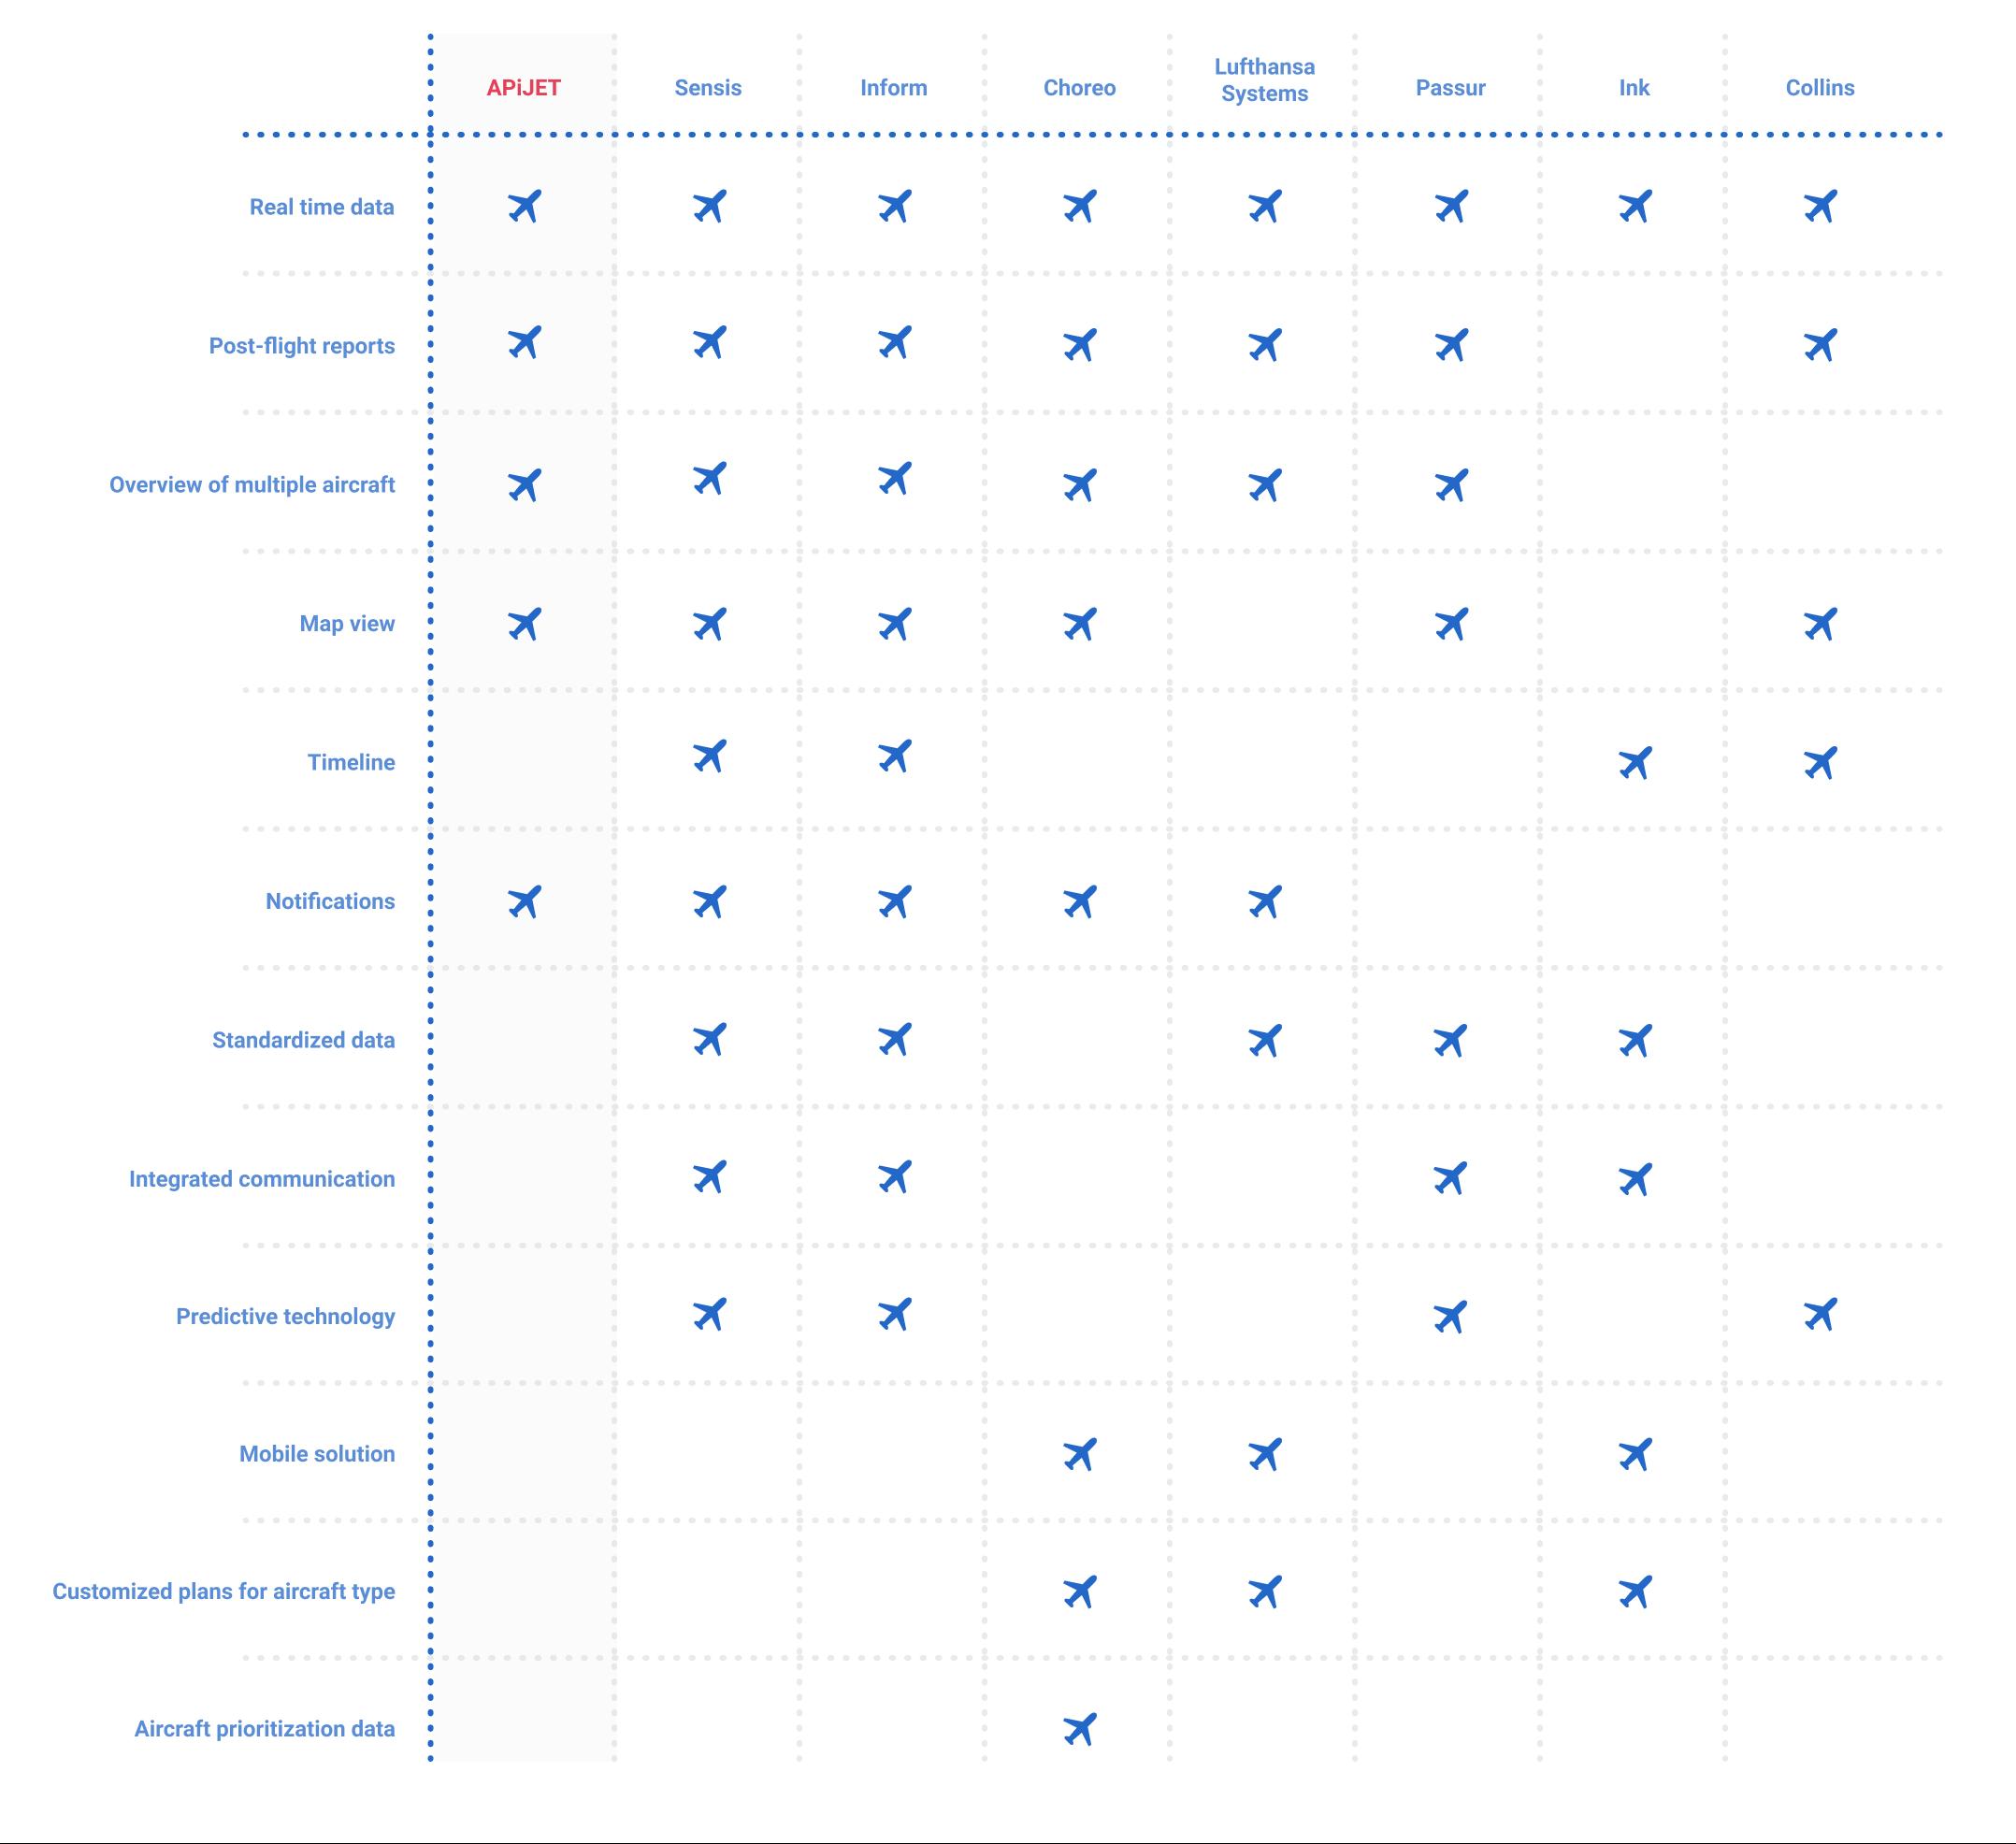 Competitive analysis of APiJET versus other turnaround software.